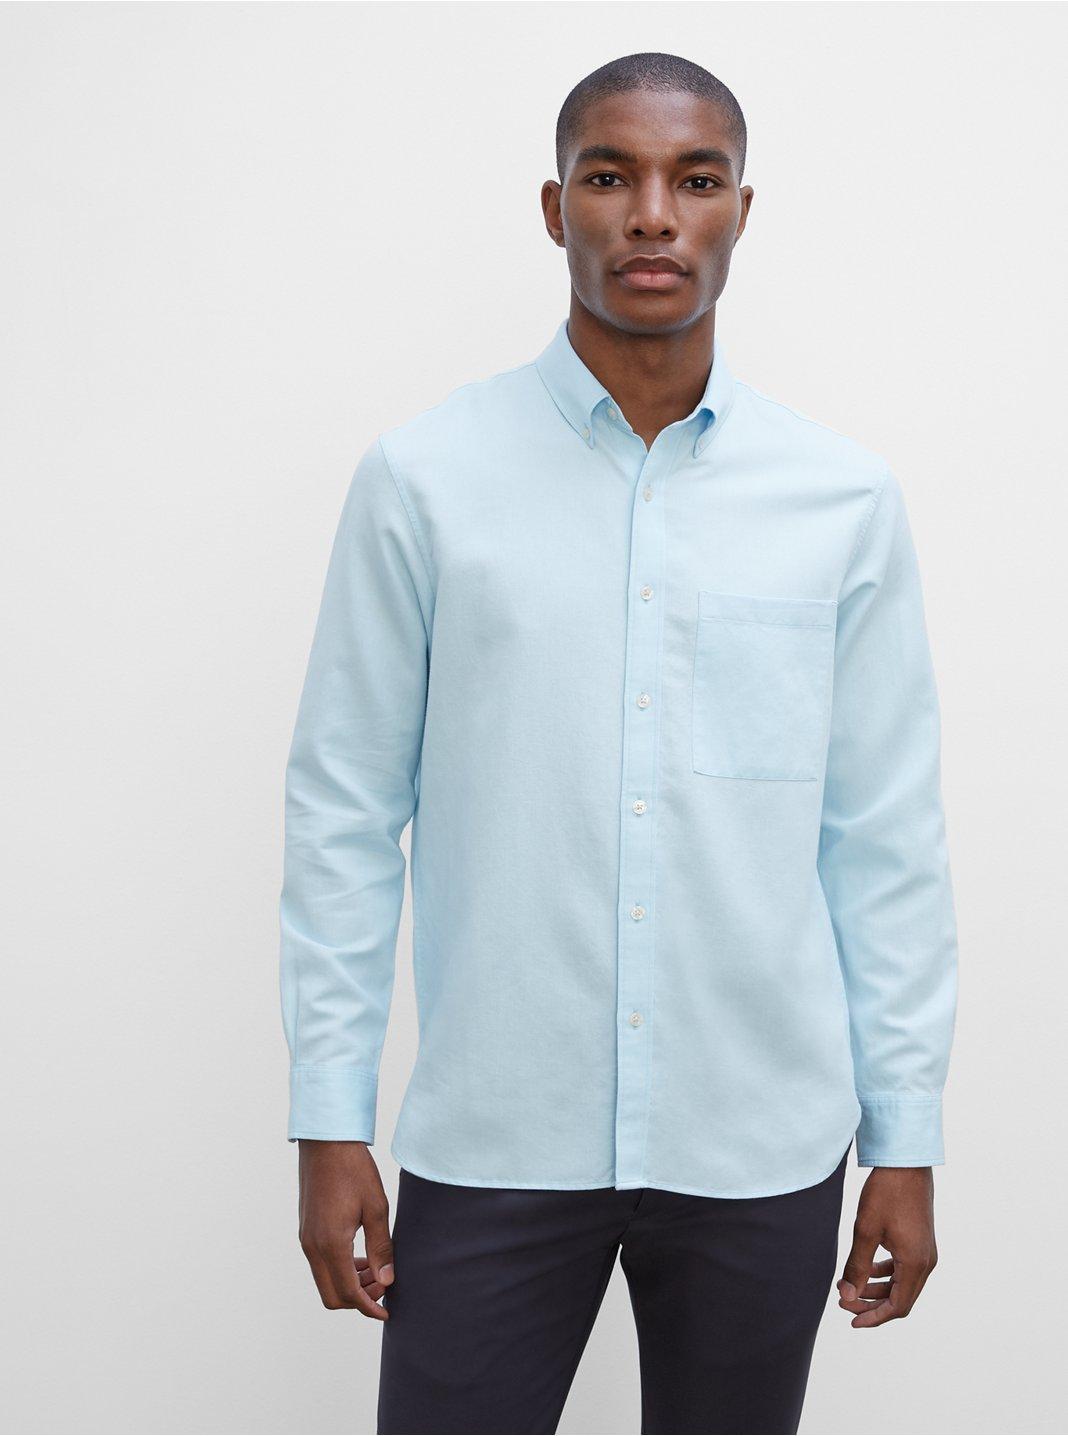 Long Sleeve Solid Twill Shirt